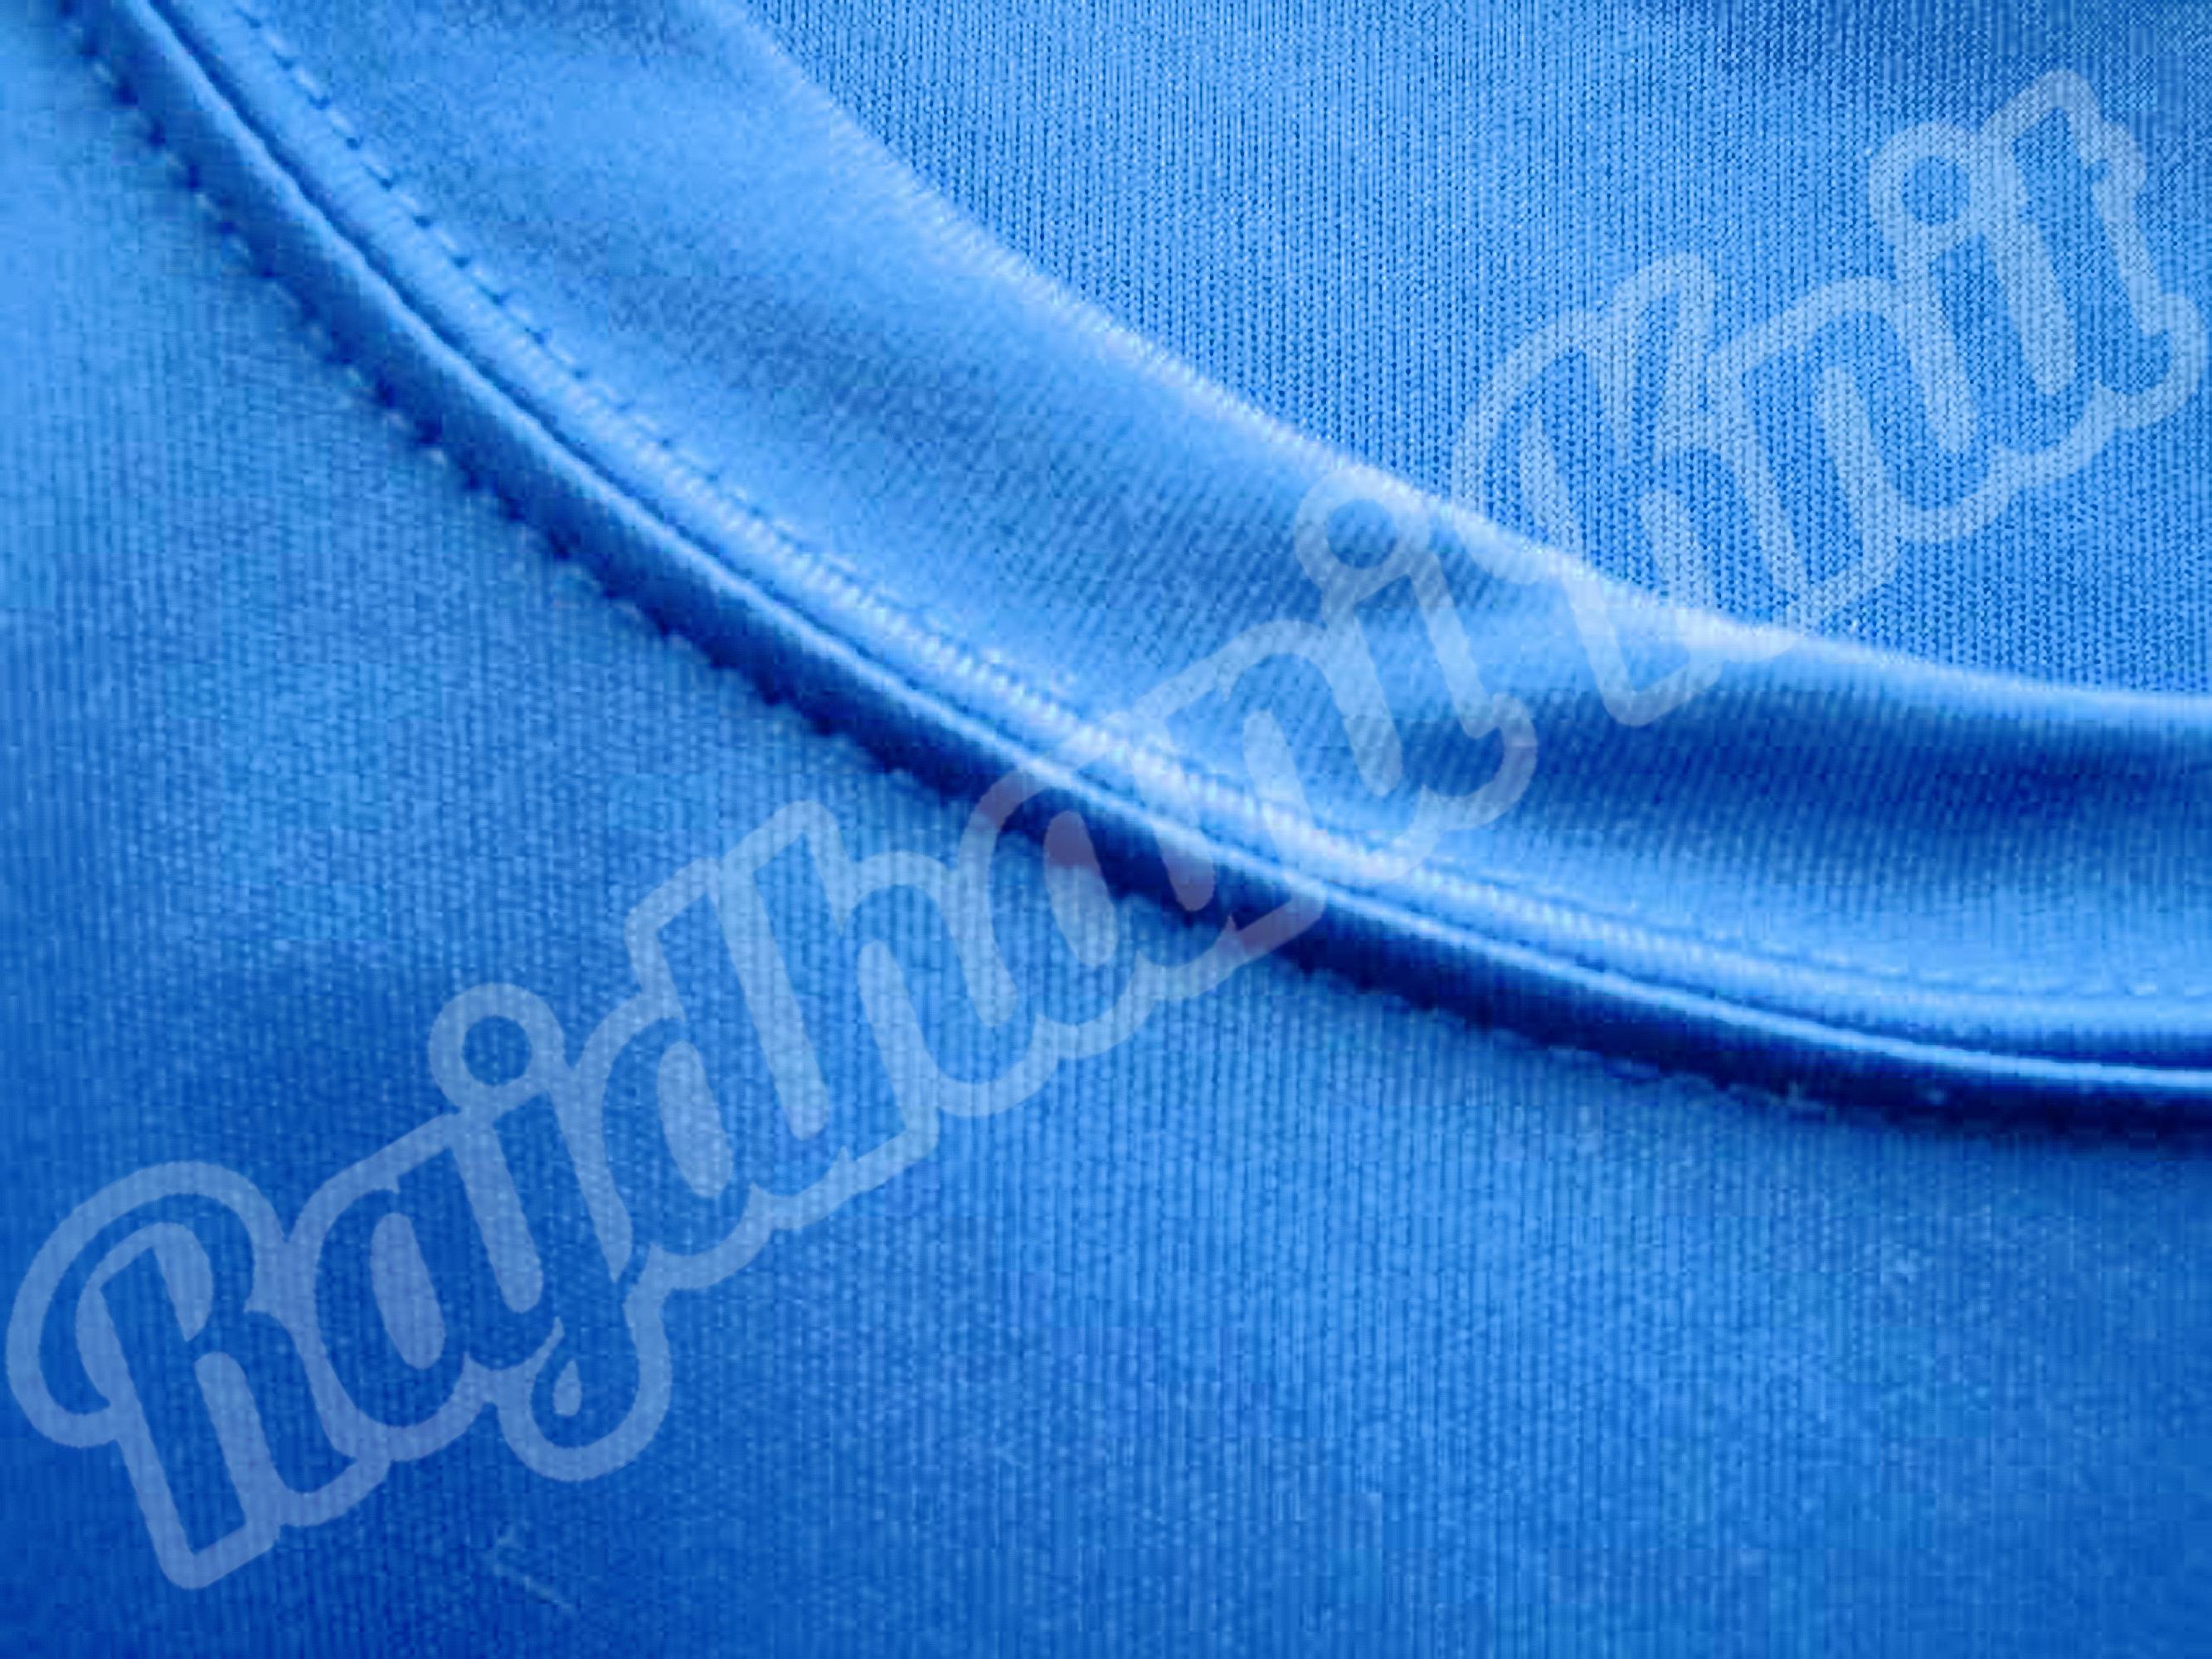 Micro Plain / Serrina fabric for sublimation